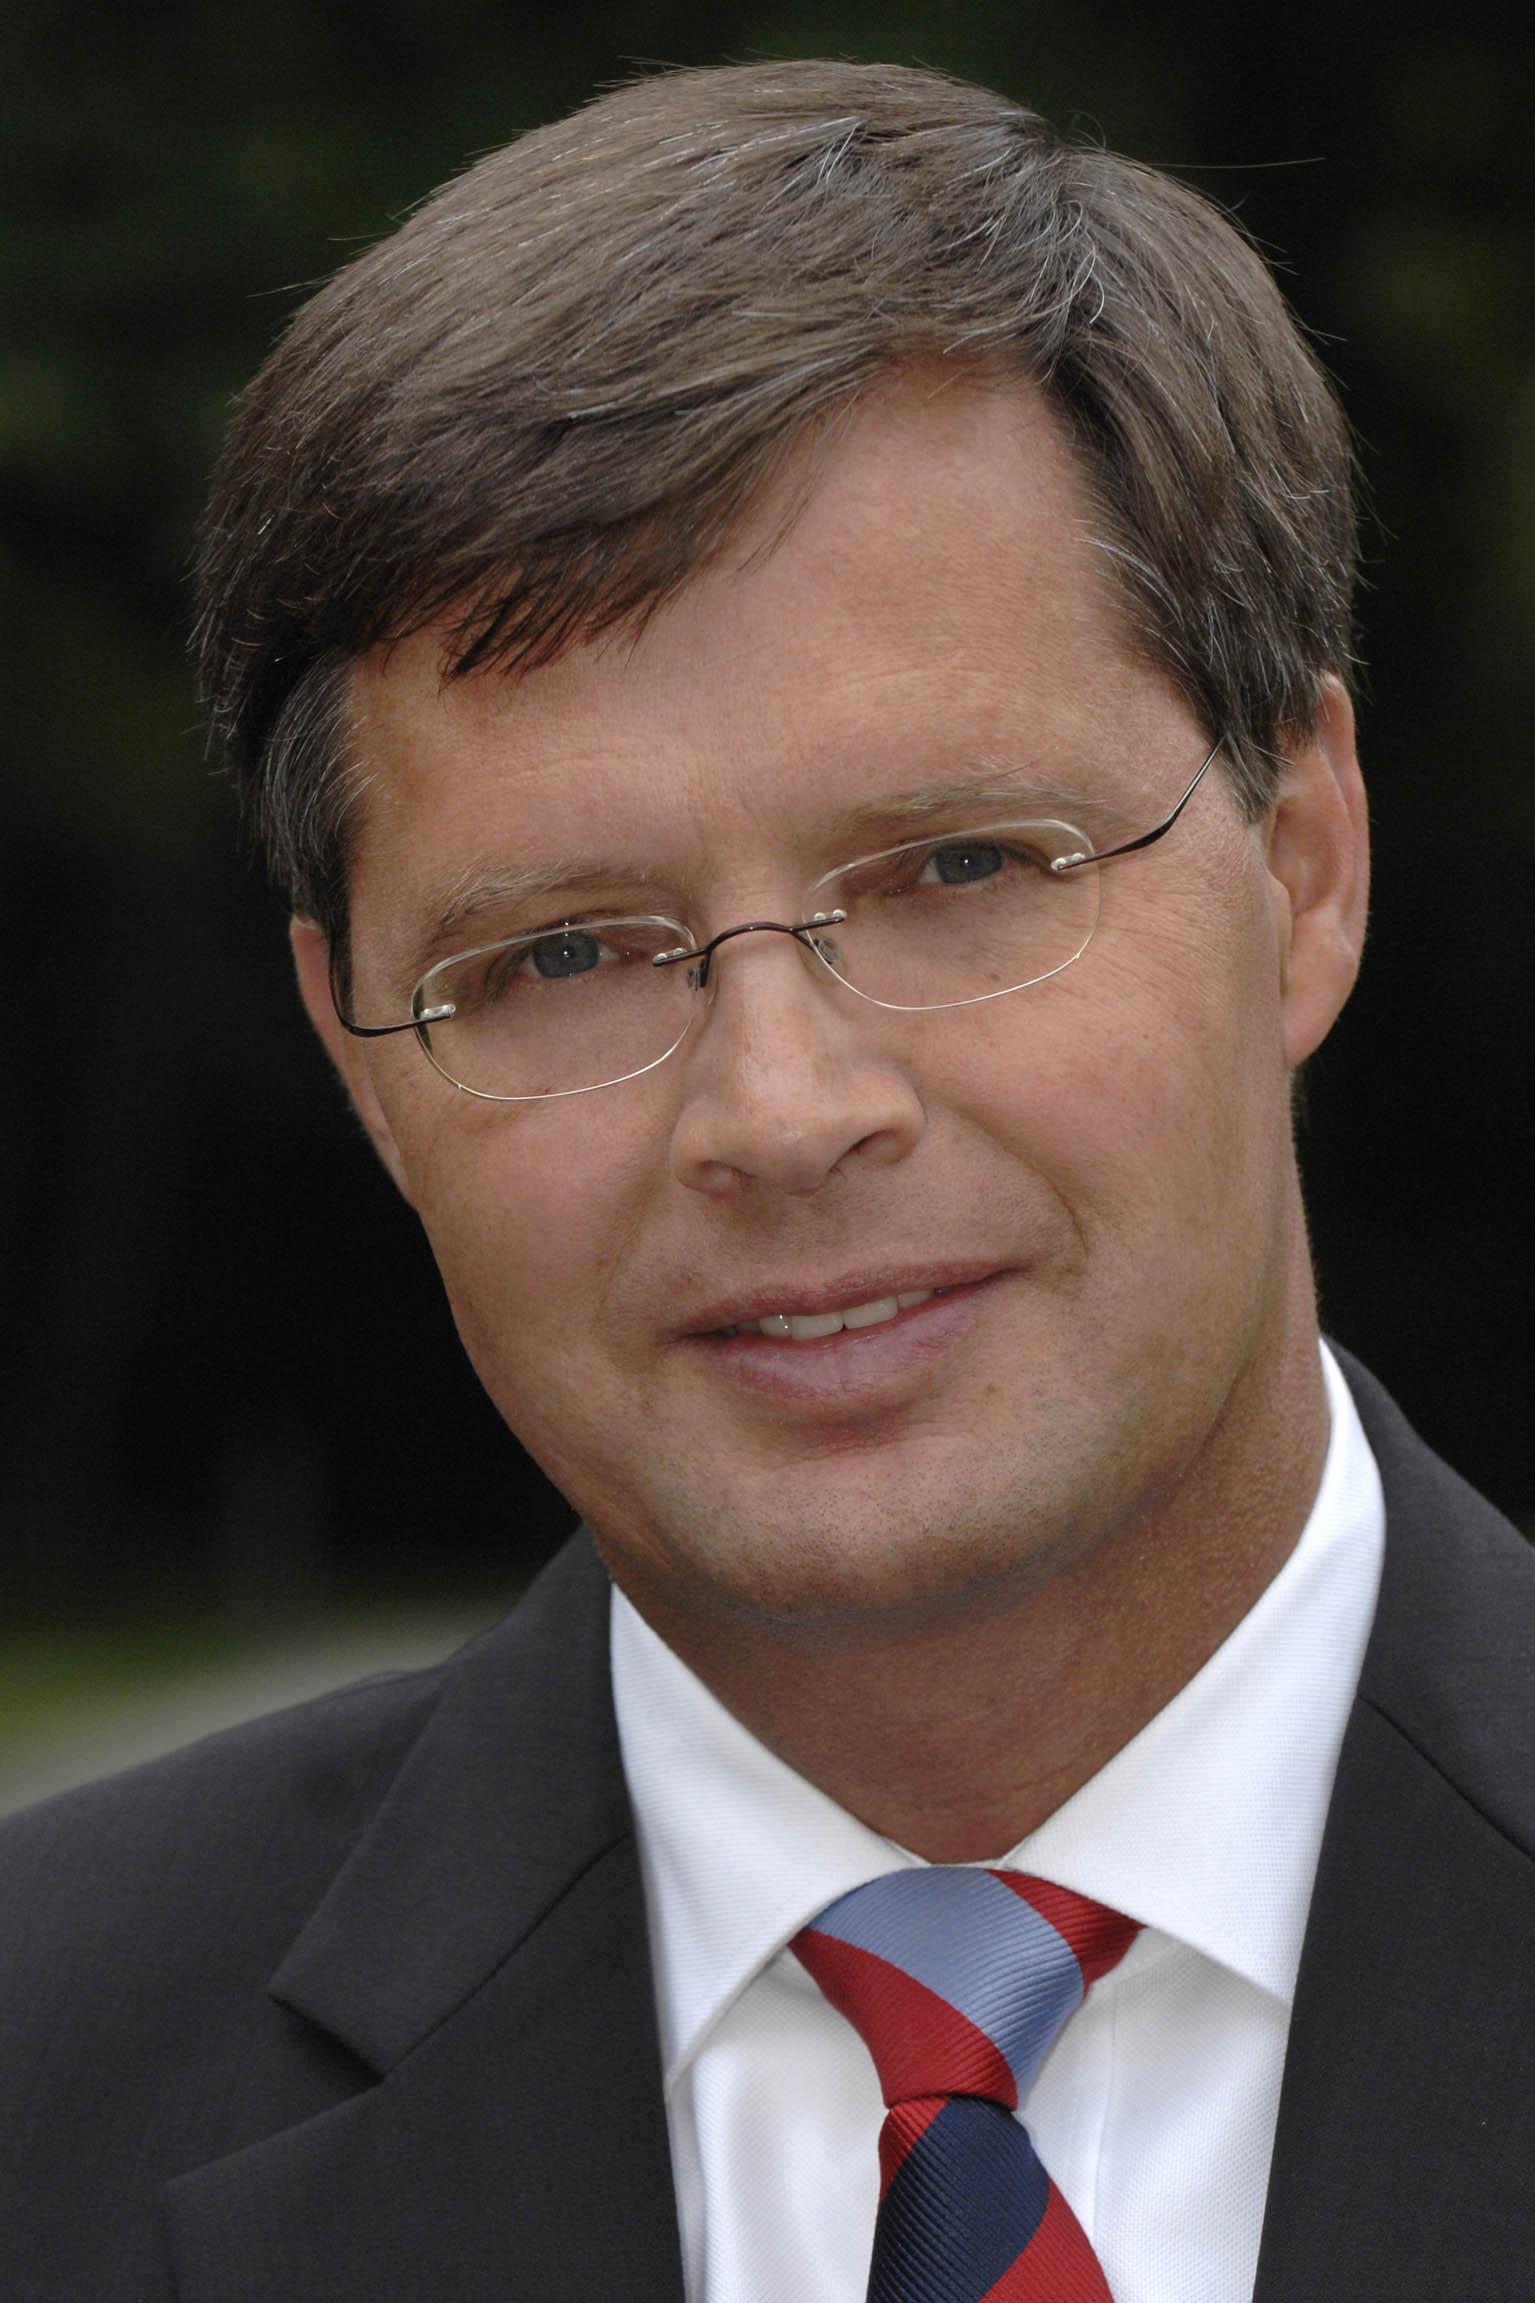 Jan Peter Balkenende Jan Peter Balkenende Wikipedia the free encyclopedia